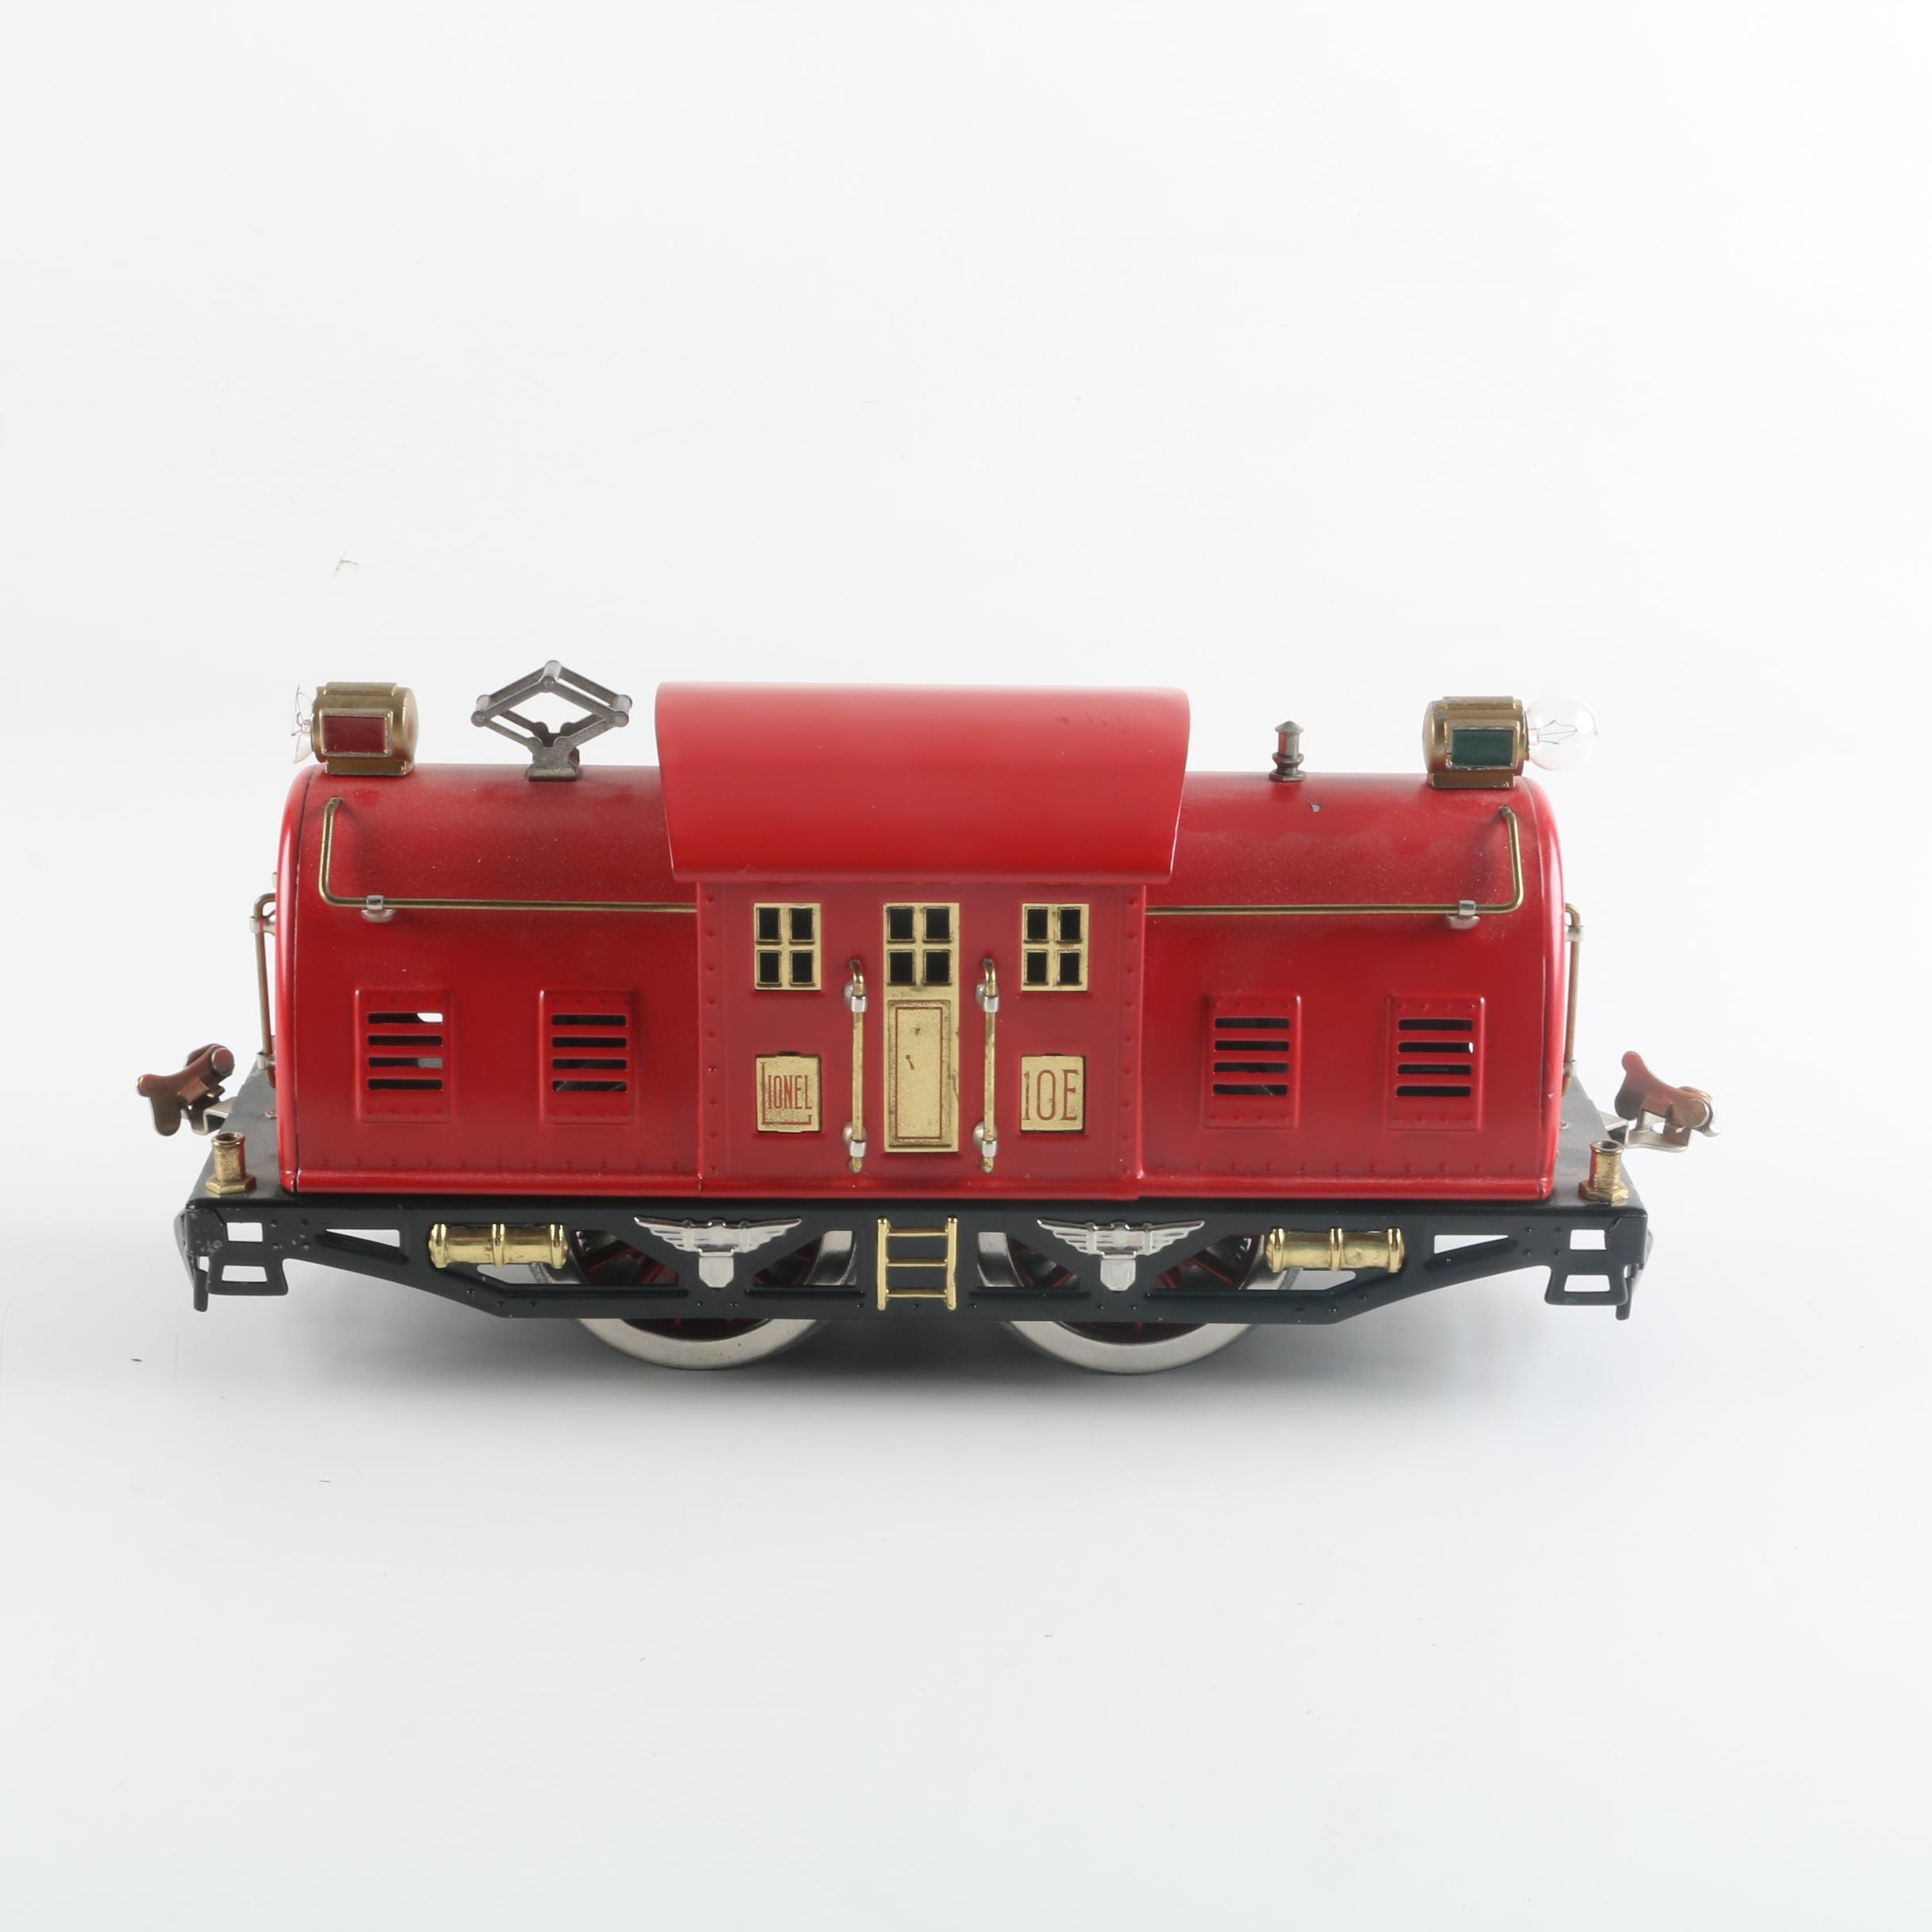 Pre-War Lionel Super Motor Locomotive